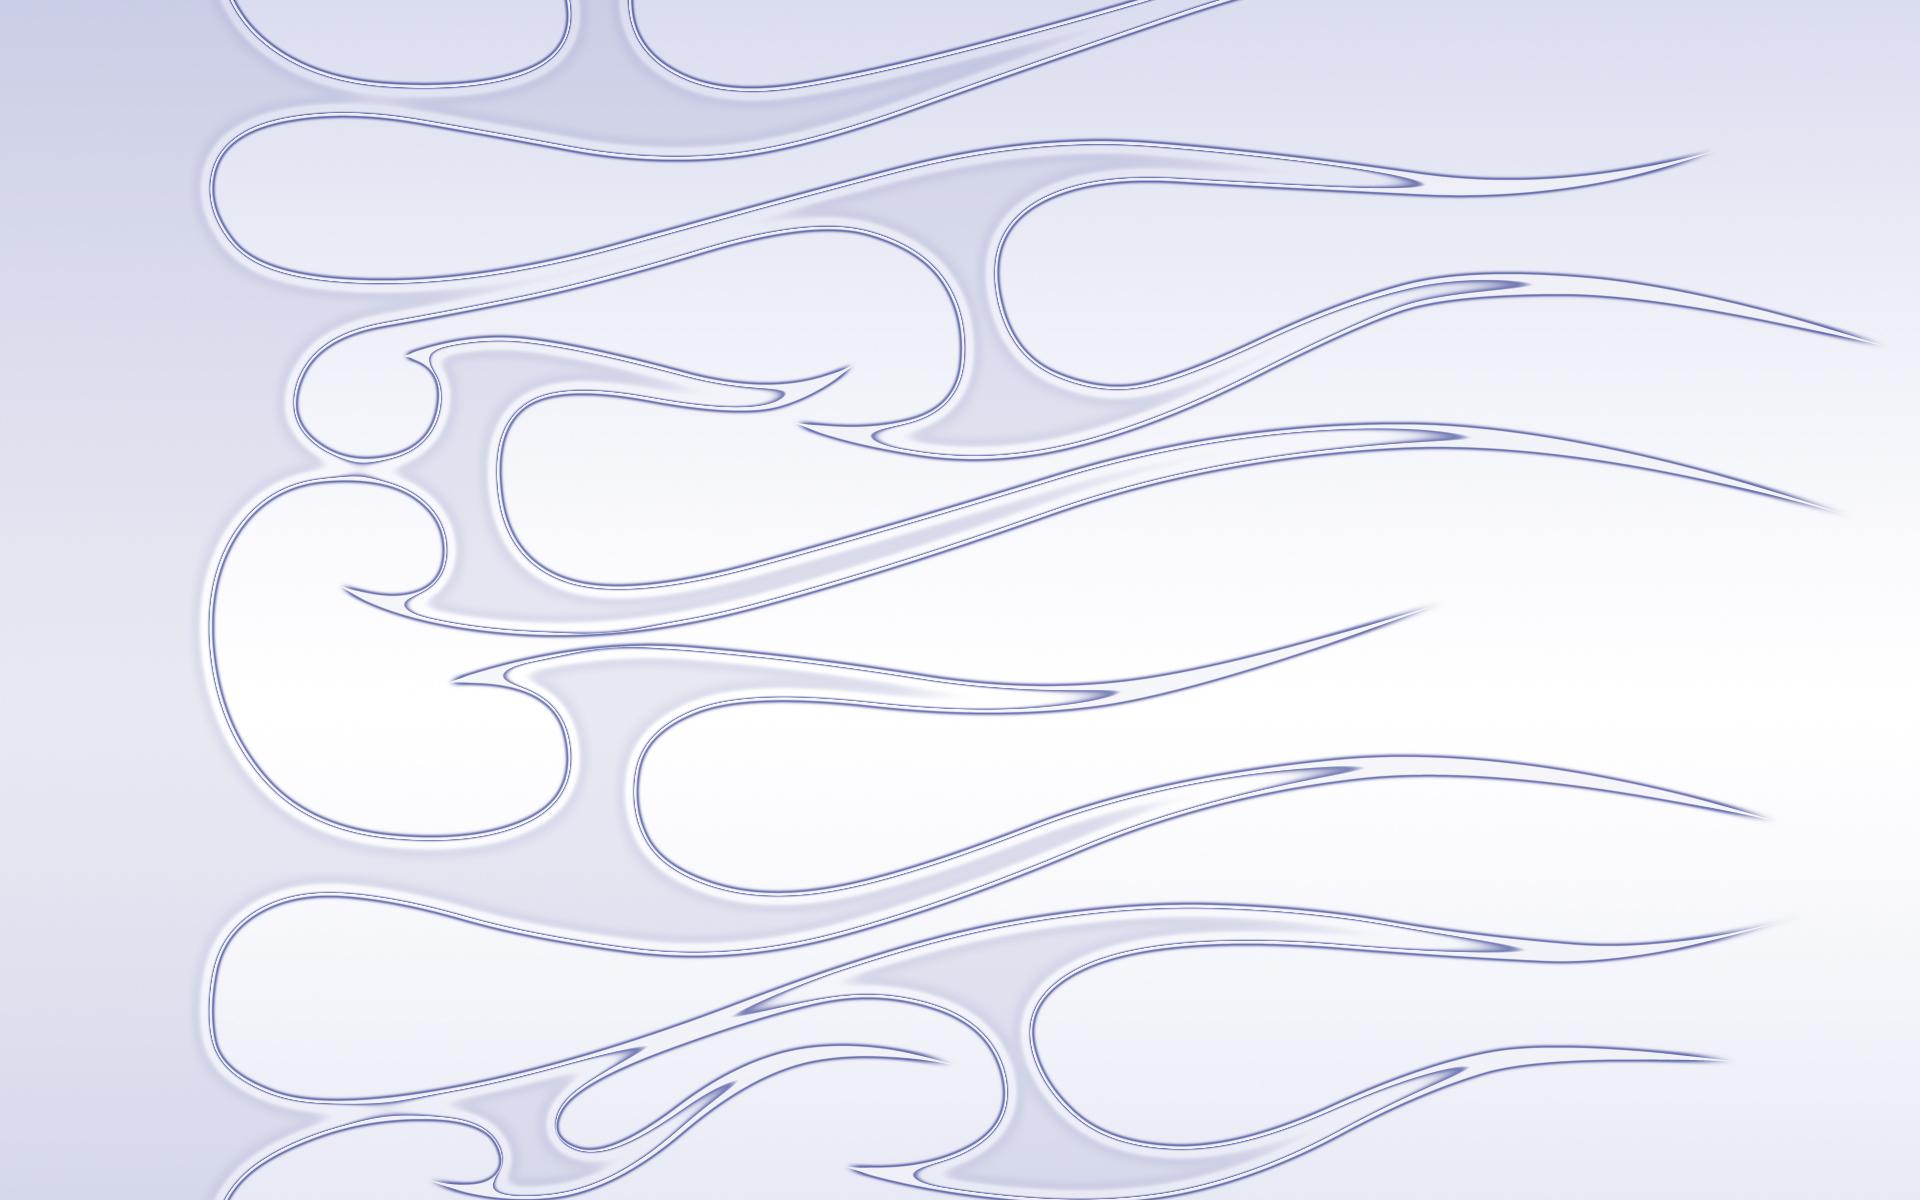 Flames - pinstripe II by